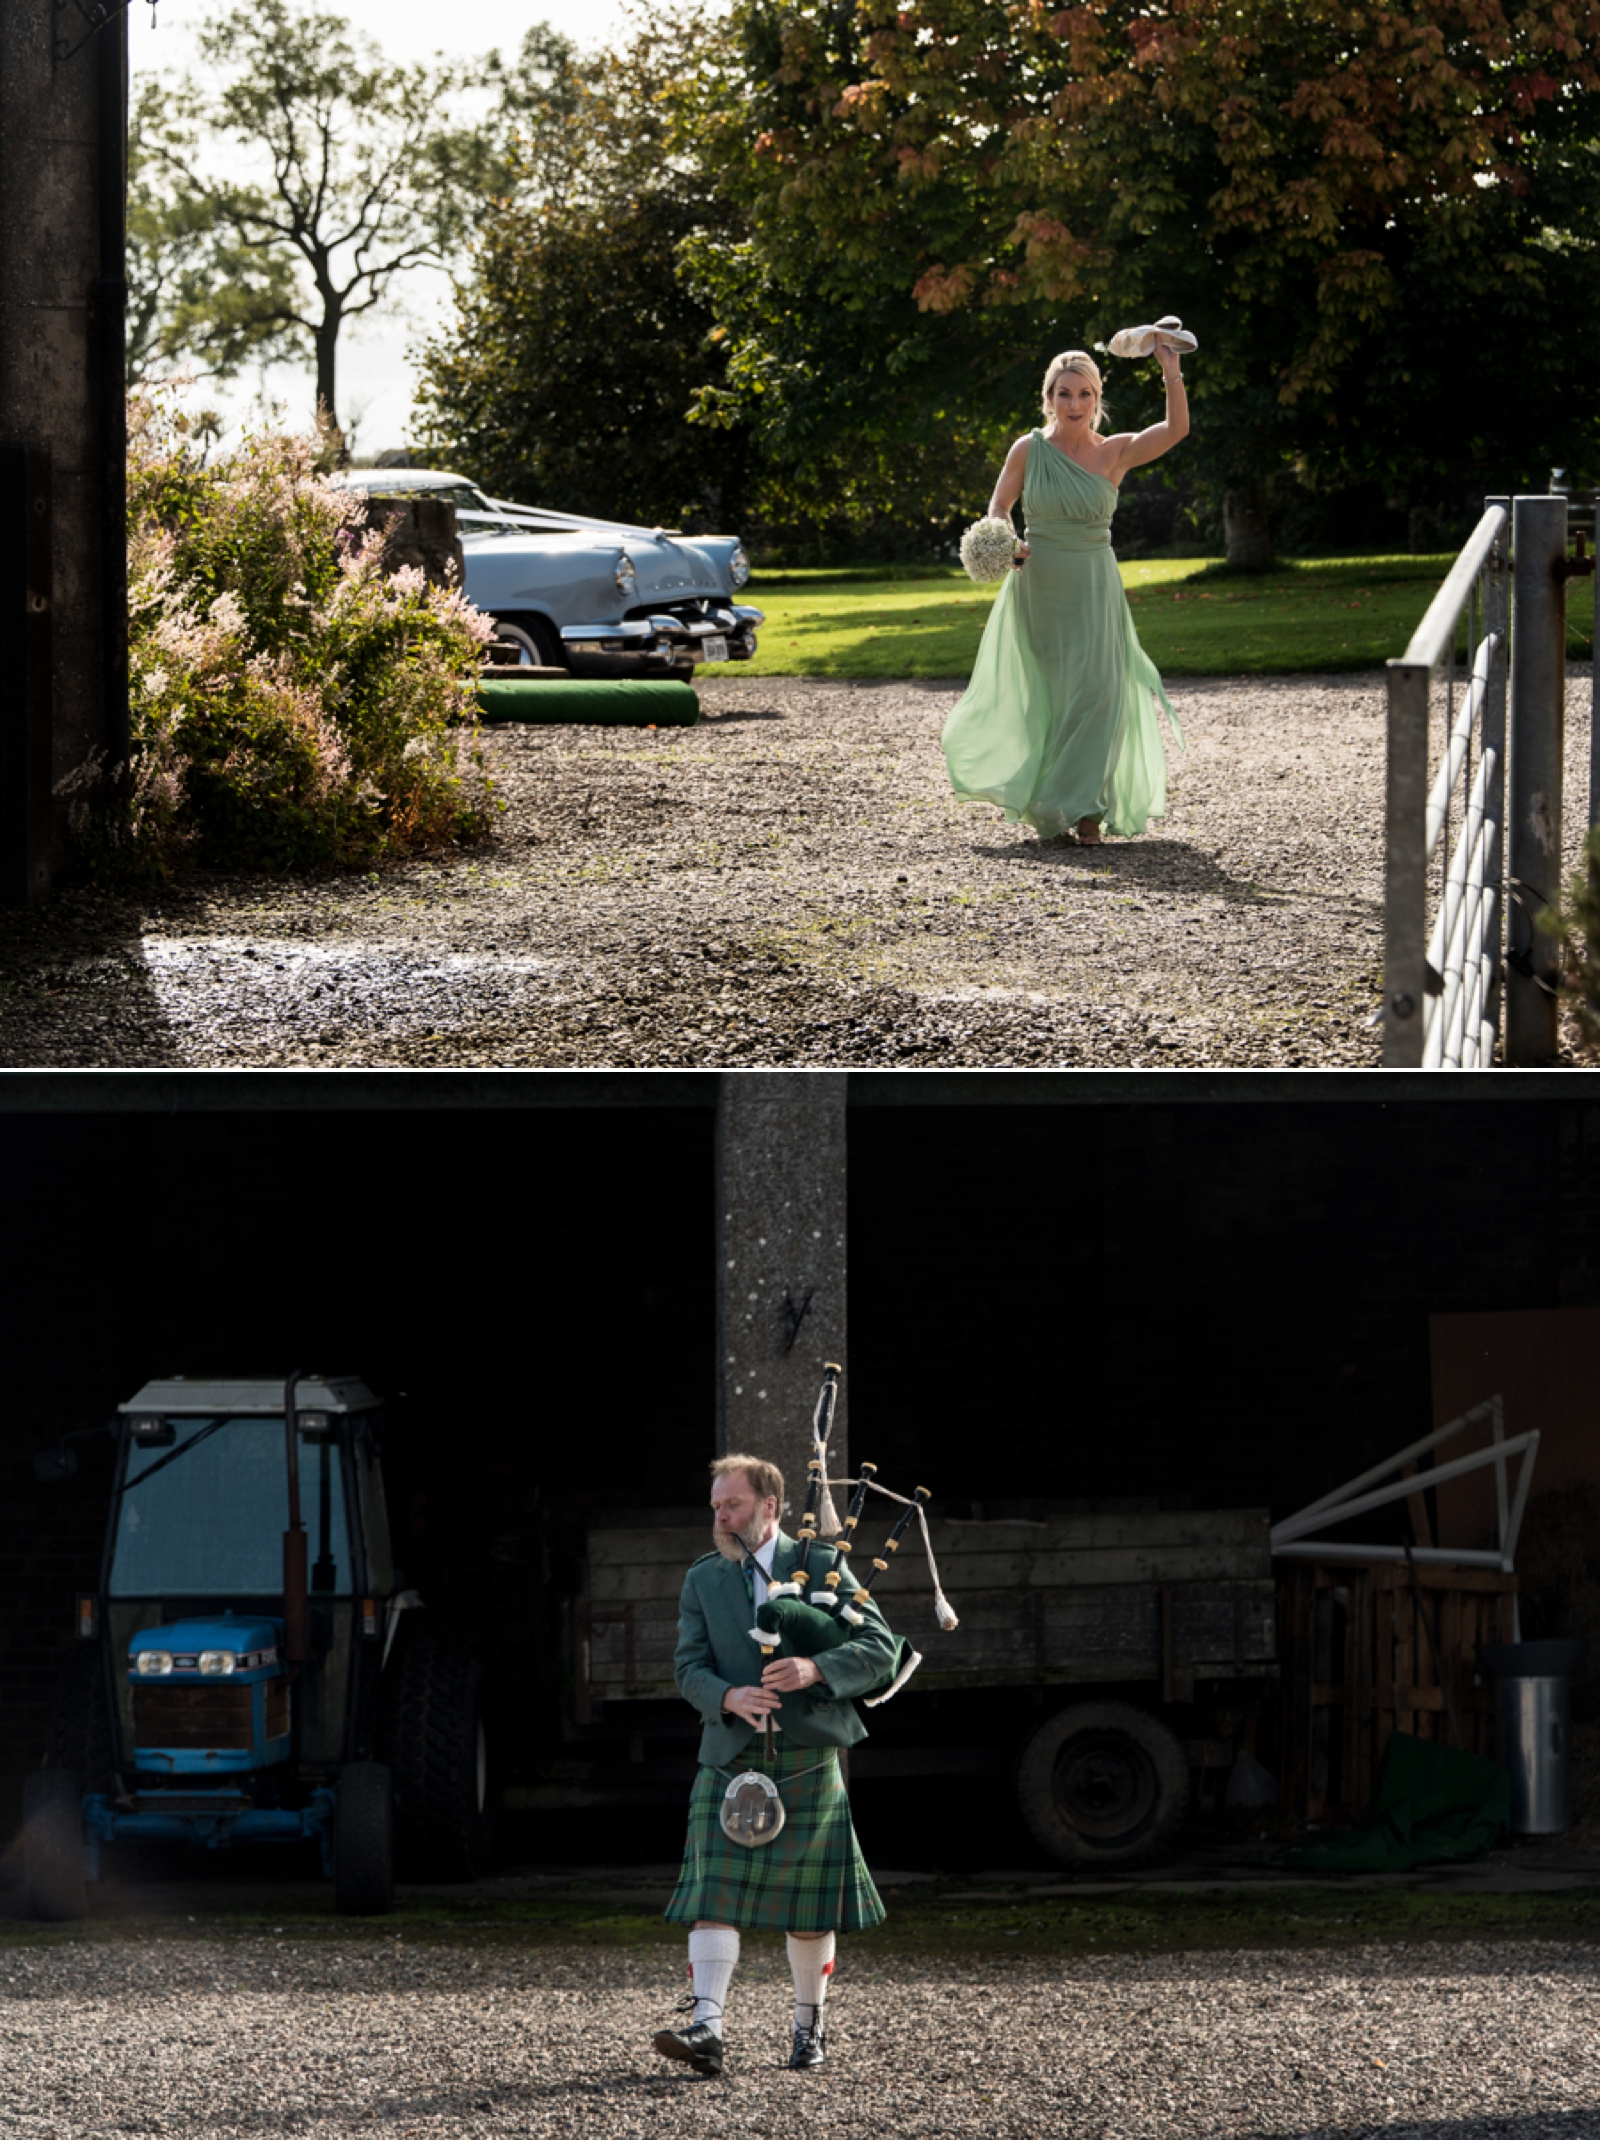 2017-09-23 (Mearns) Pratis Farm Wedding Photography125647.jpg